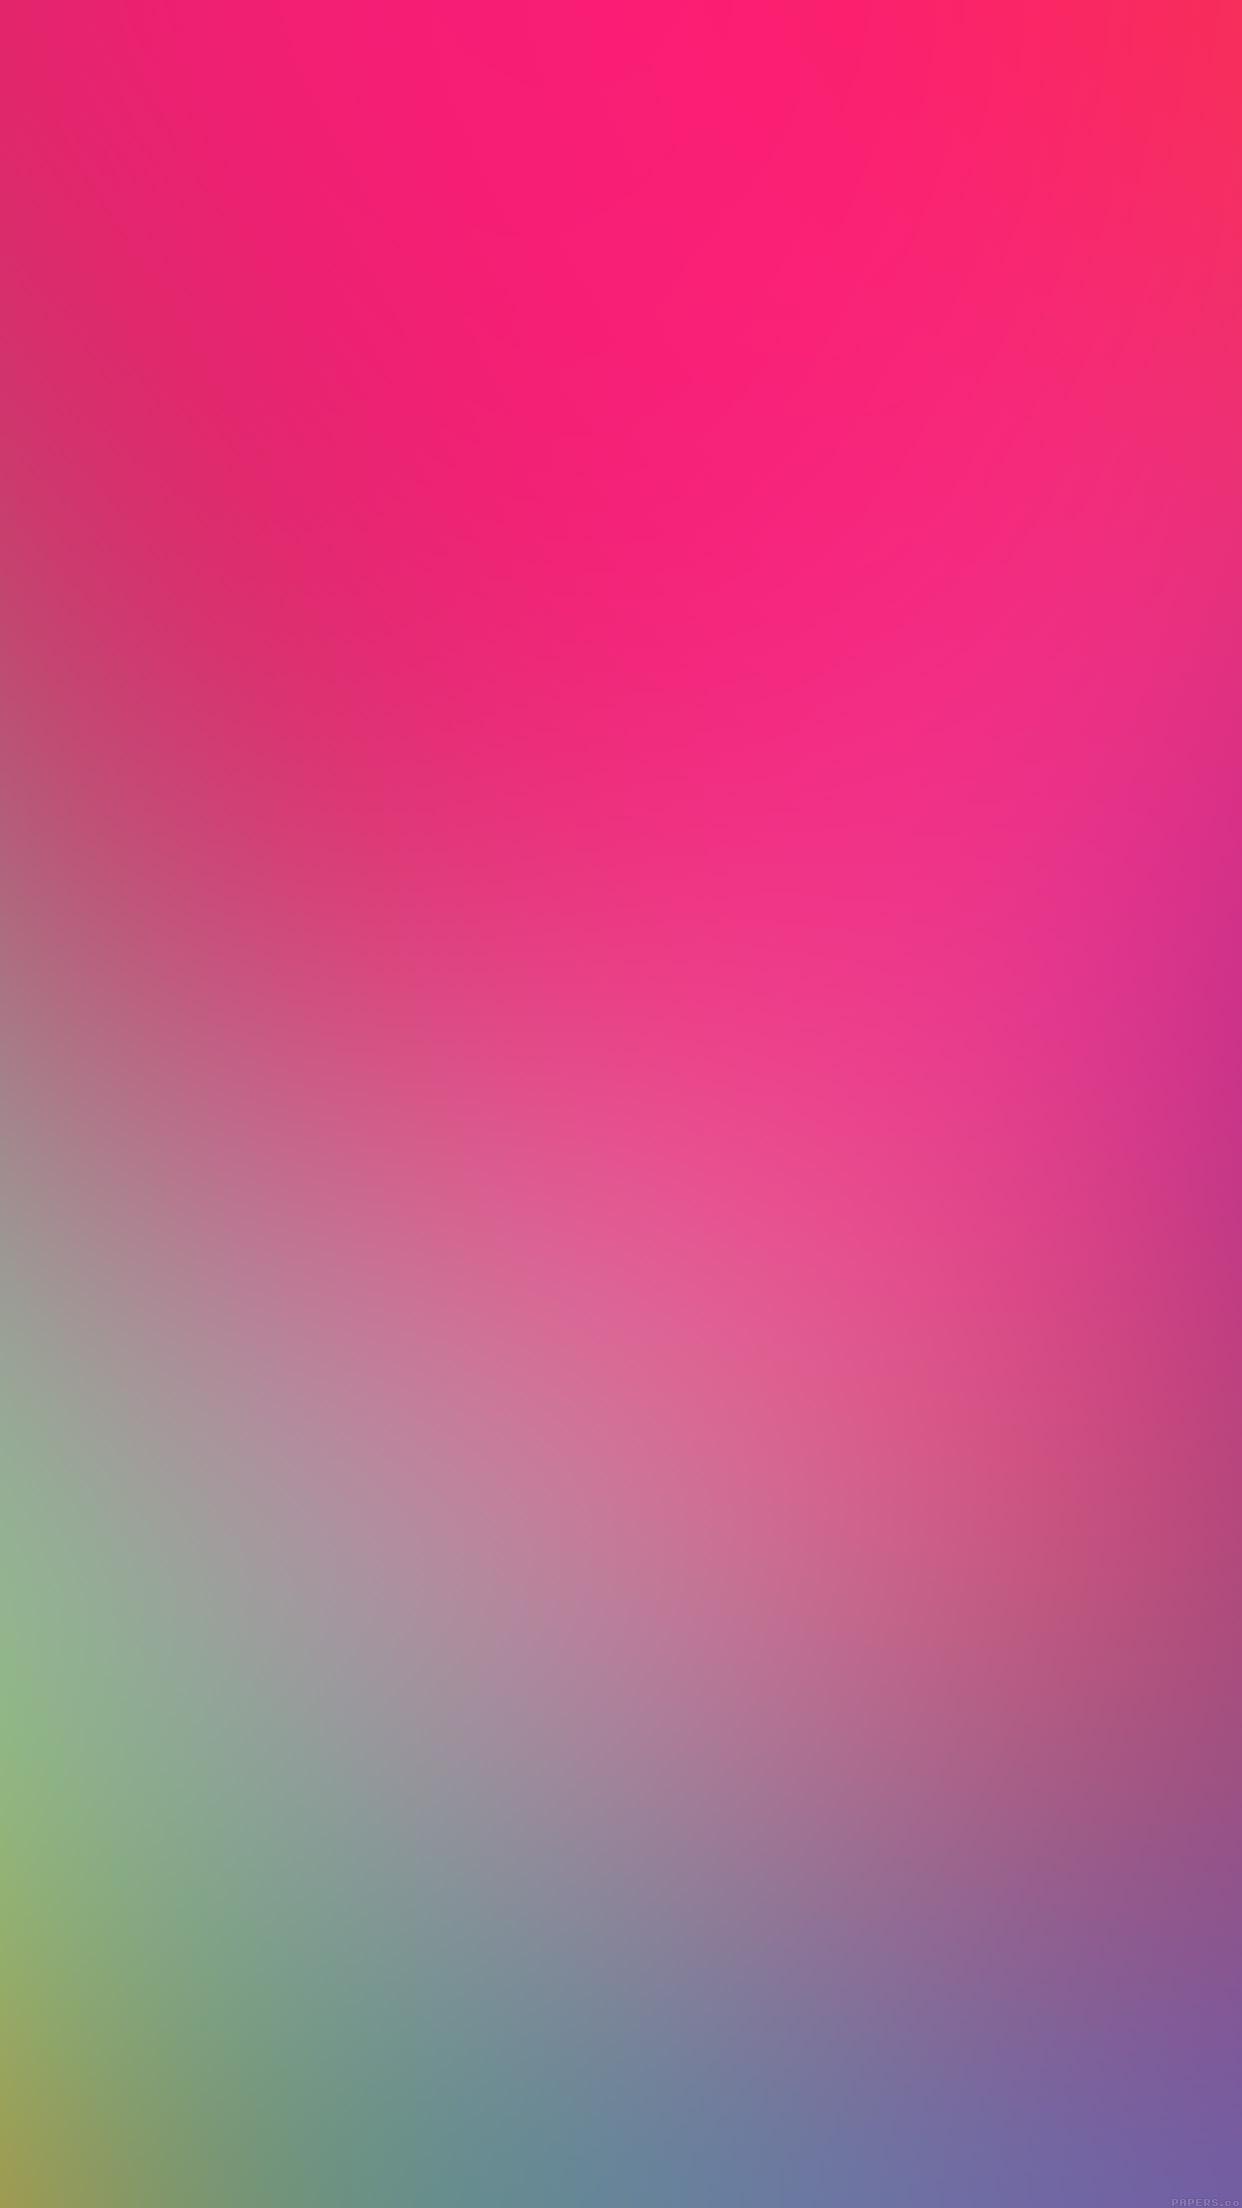 color gradation coloring pages - photo#14